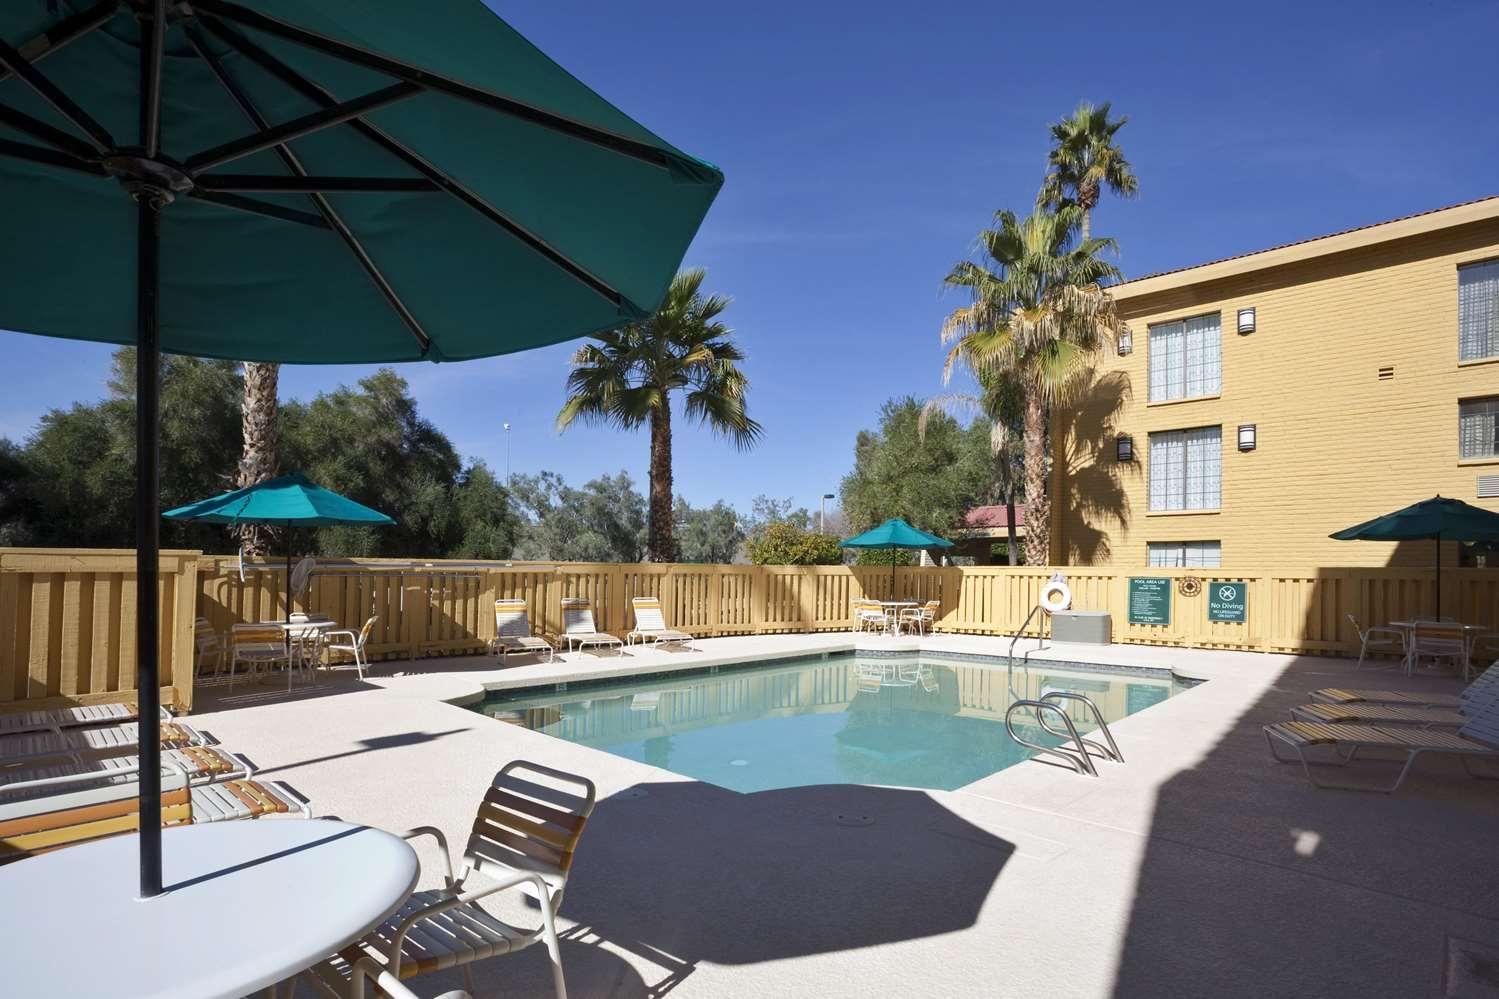 Pool - La Quinta Inn South Airport Tempe